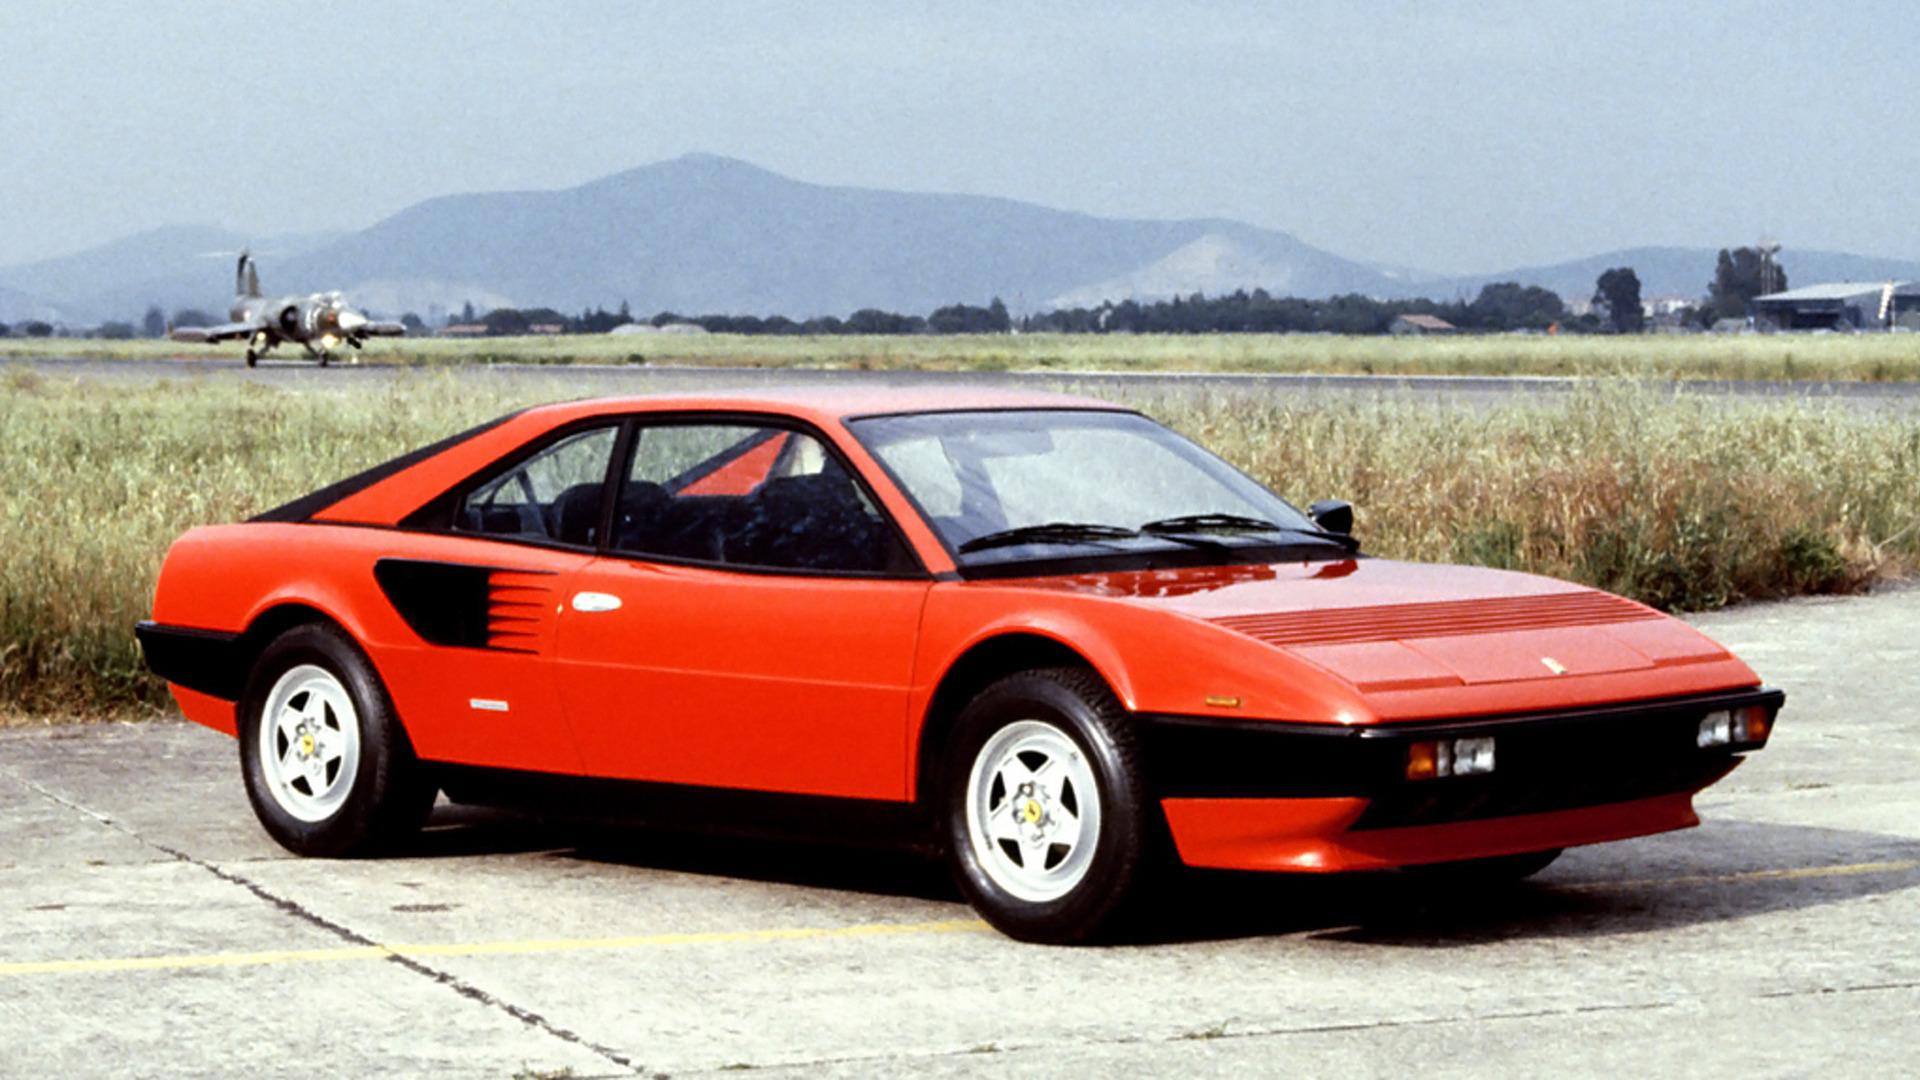 luxury ferrari and worst car by them